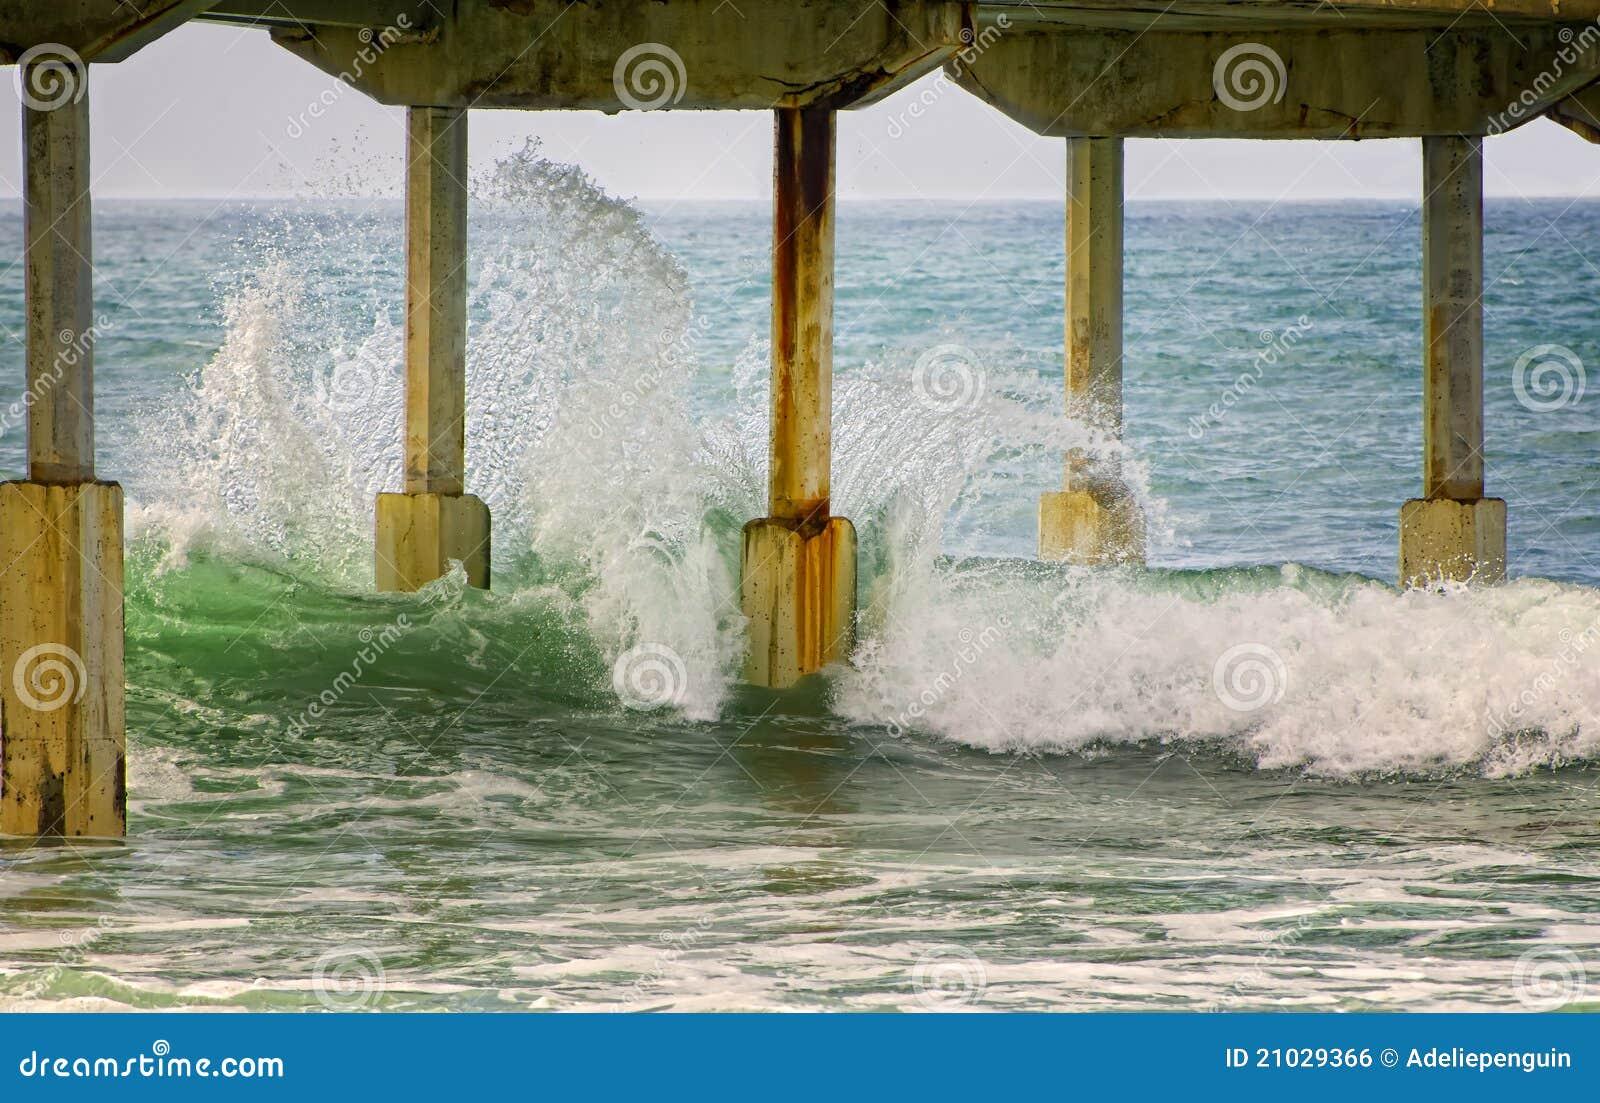 Waves Hitting Pier, San Diego California